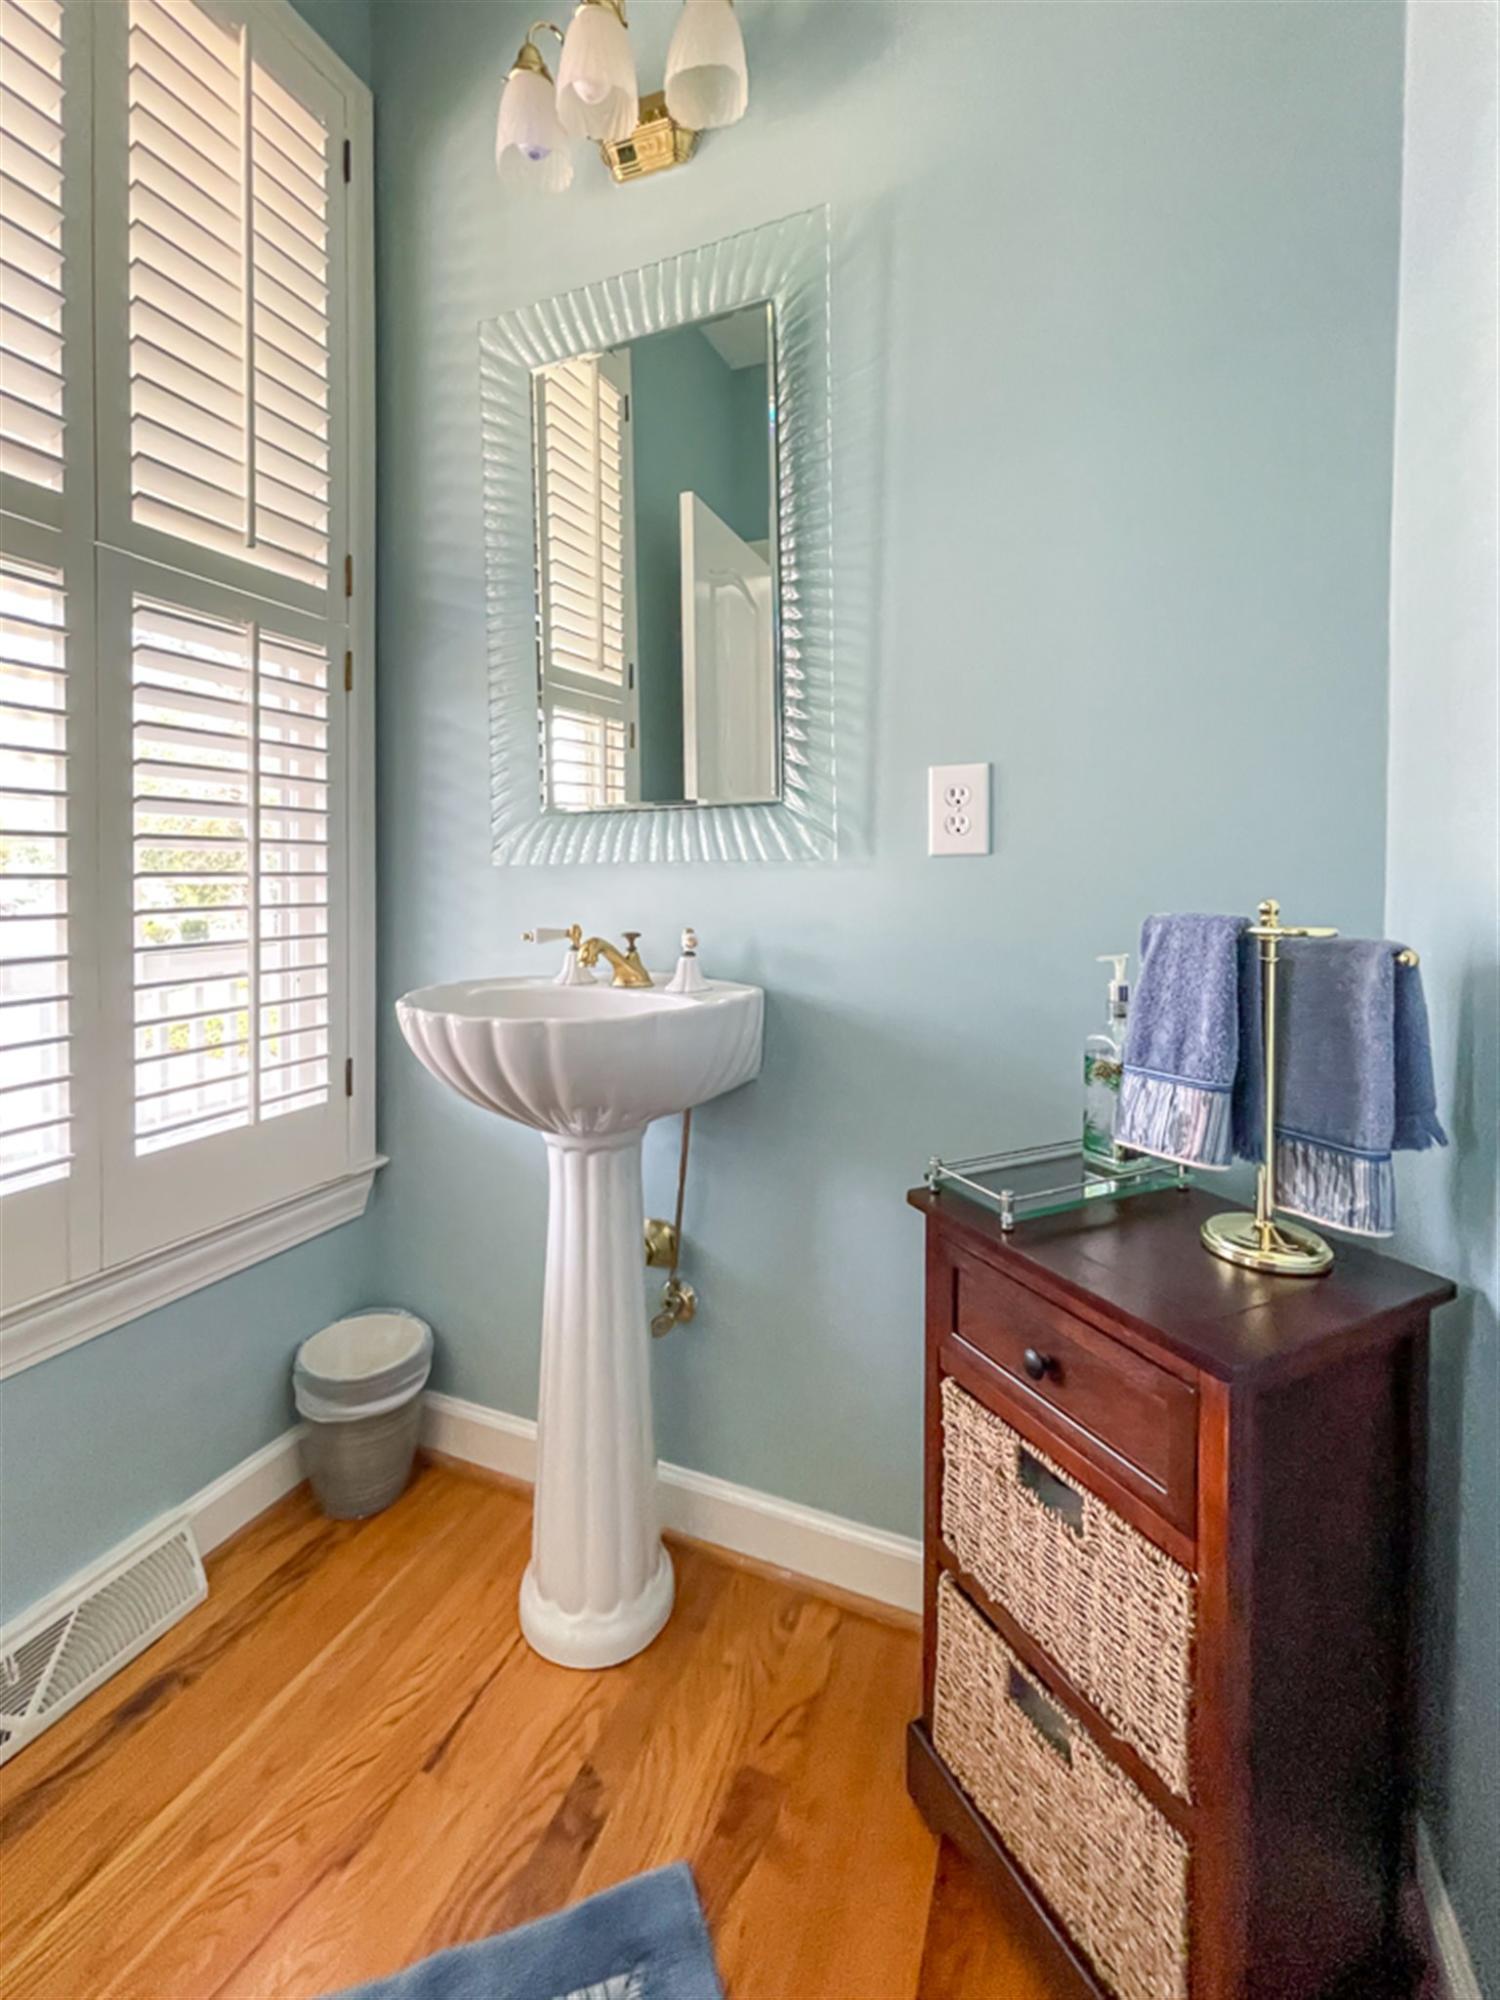 Indigo Point Homes For Sale - 50 Indigo Point, Charleston, SC - 7